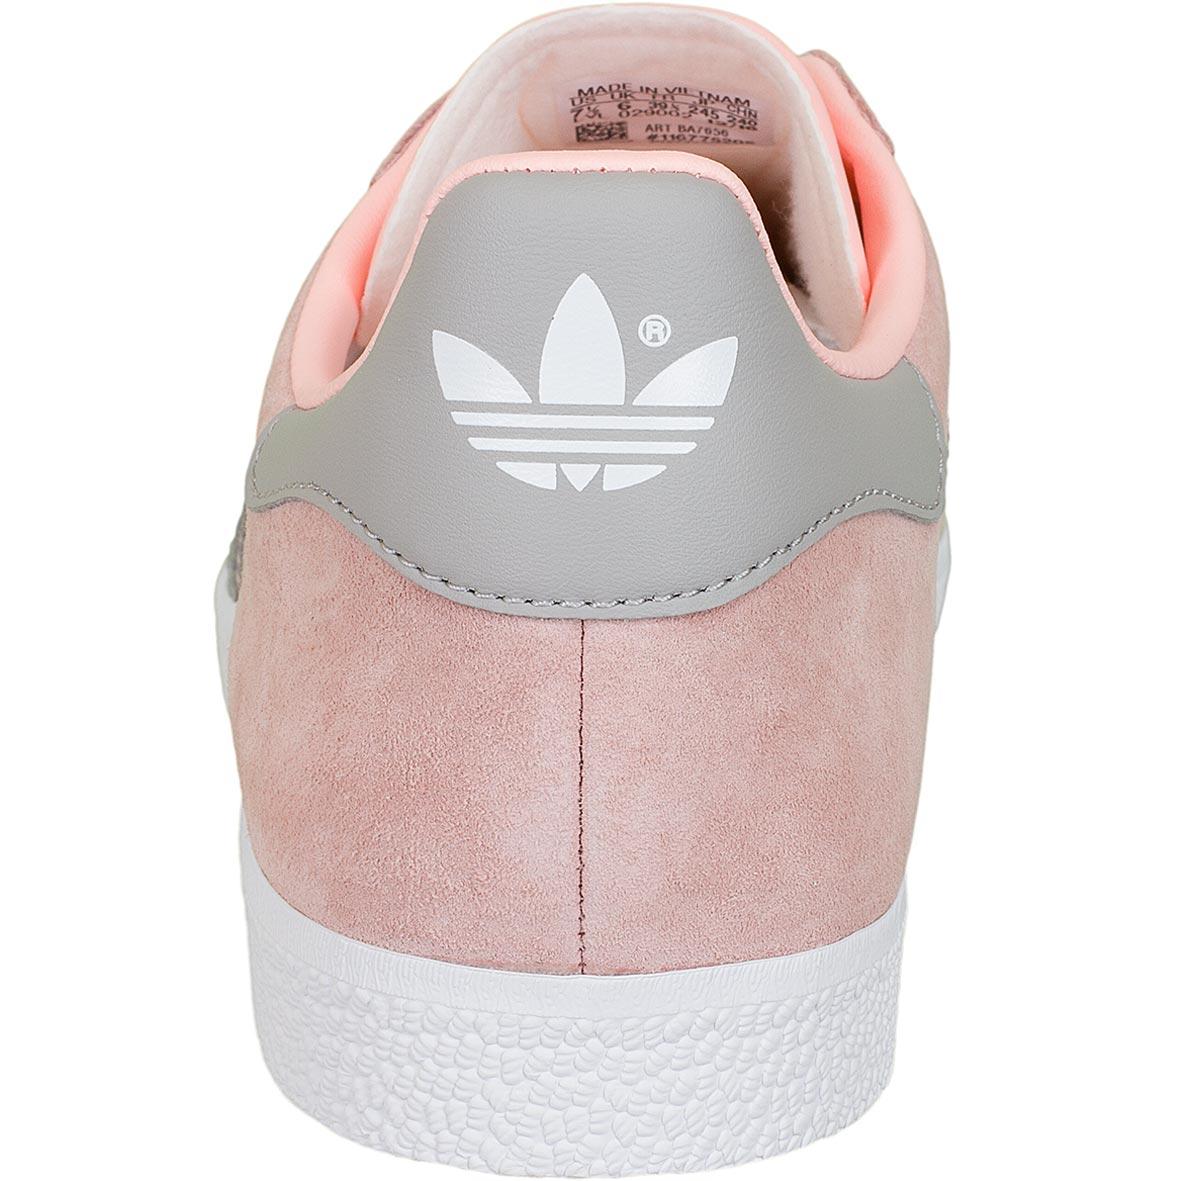 new styles 31a22 3d347 Adidas Originals Damen Sneaker Gazelle rosa/grau